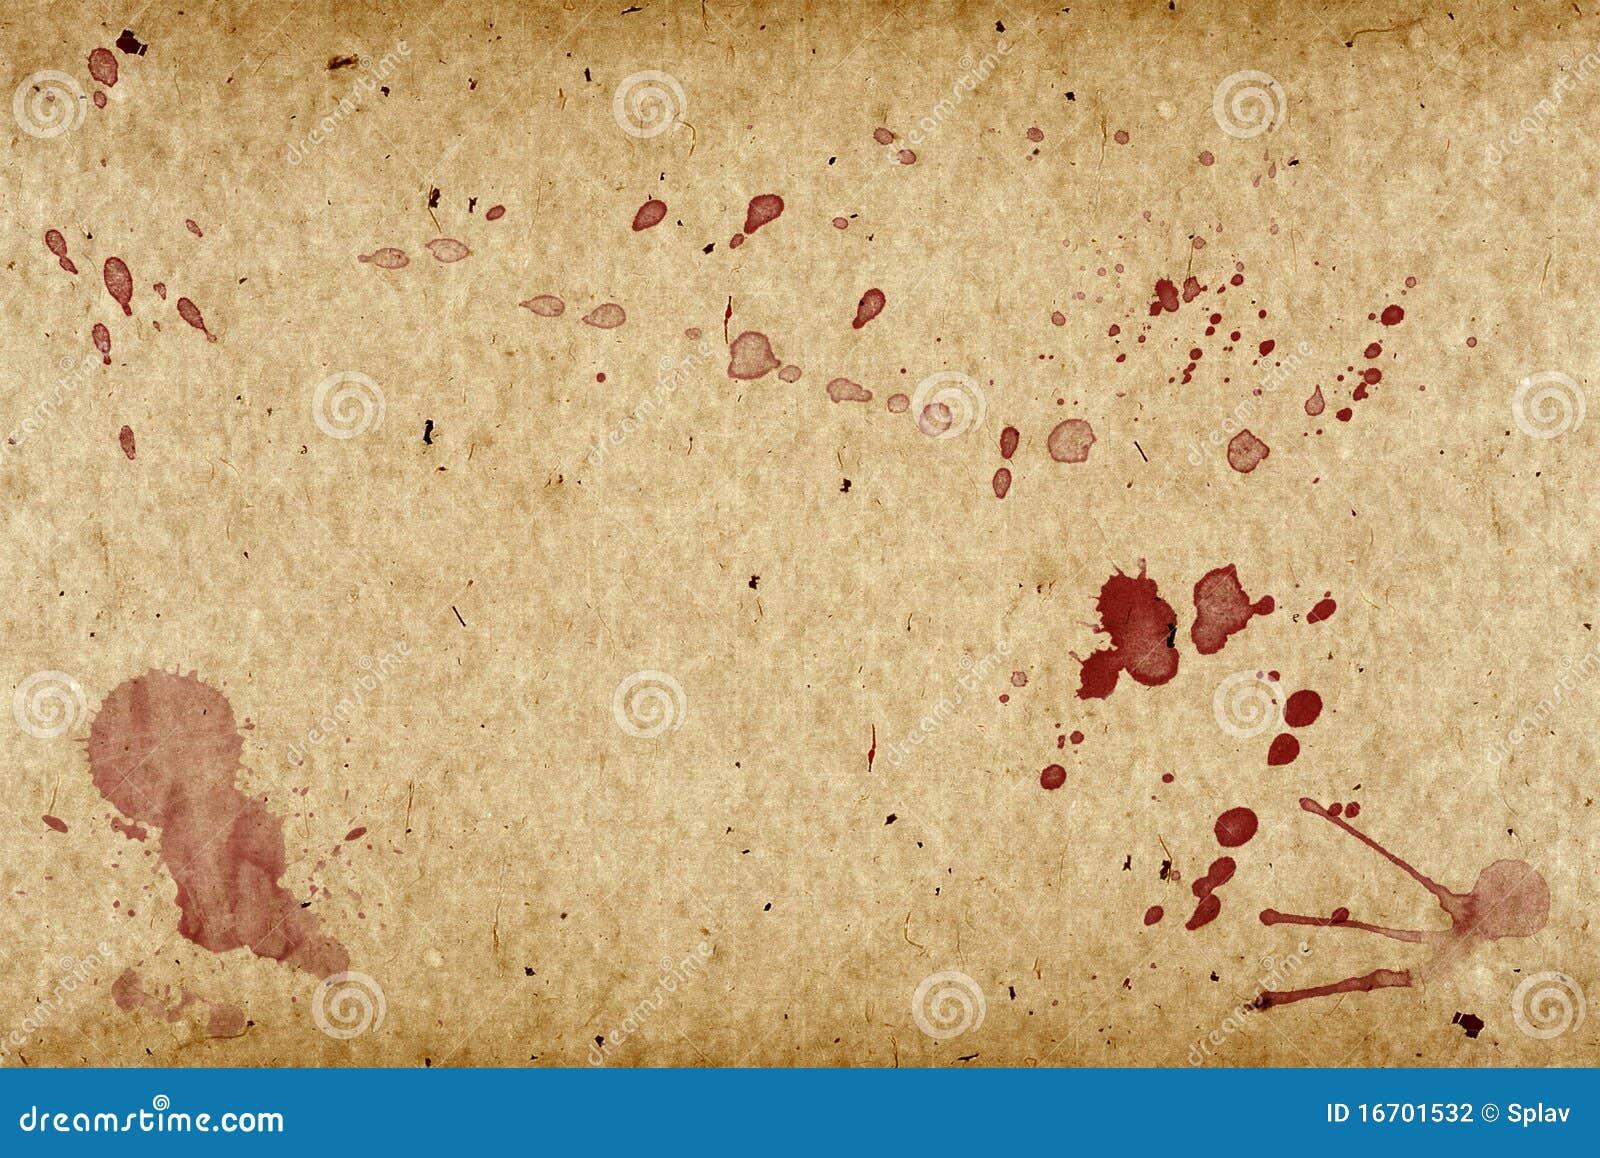 blood essays